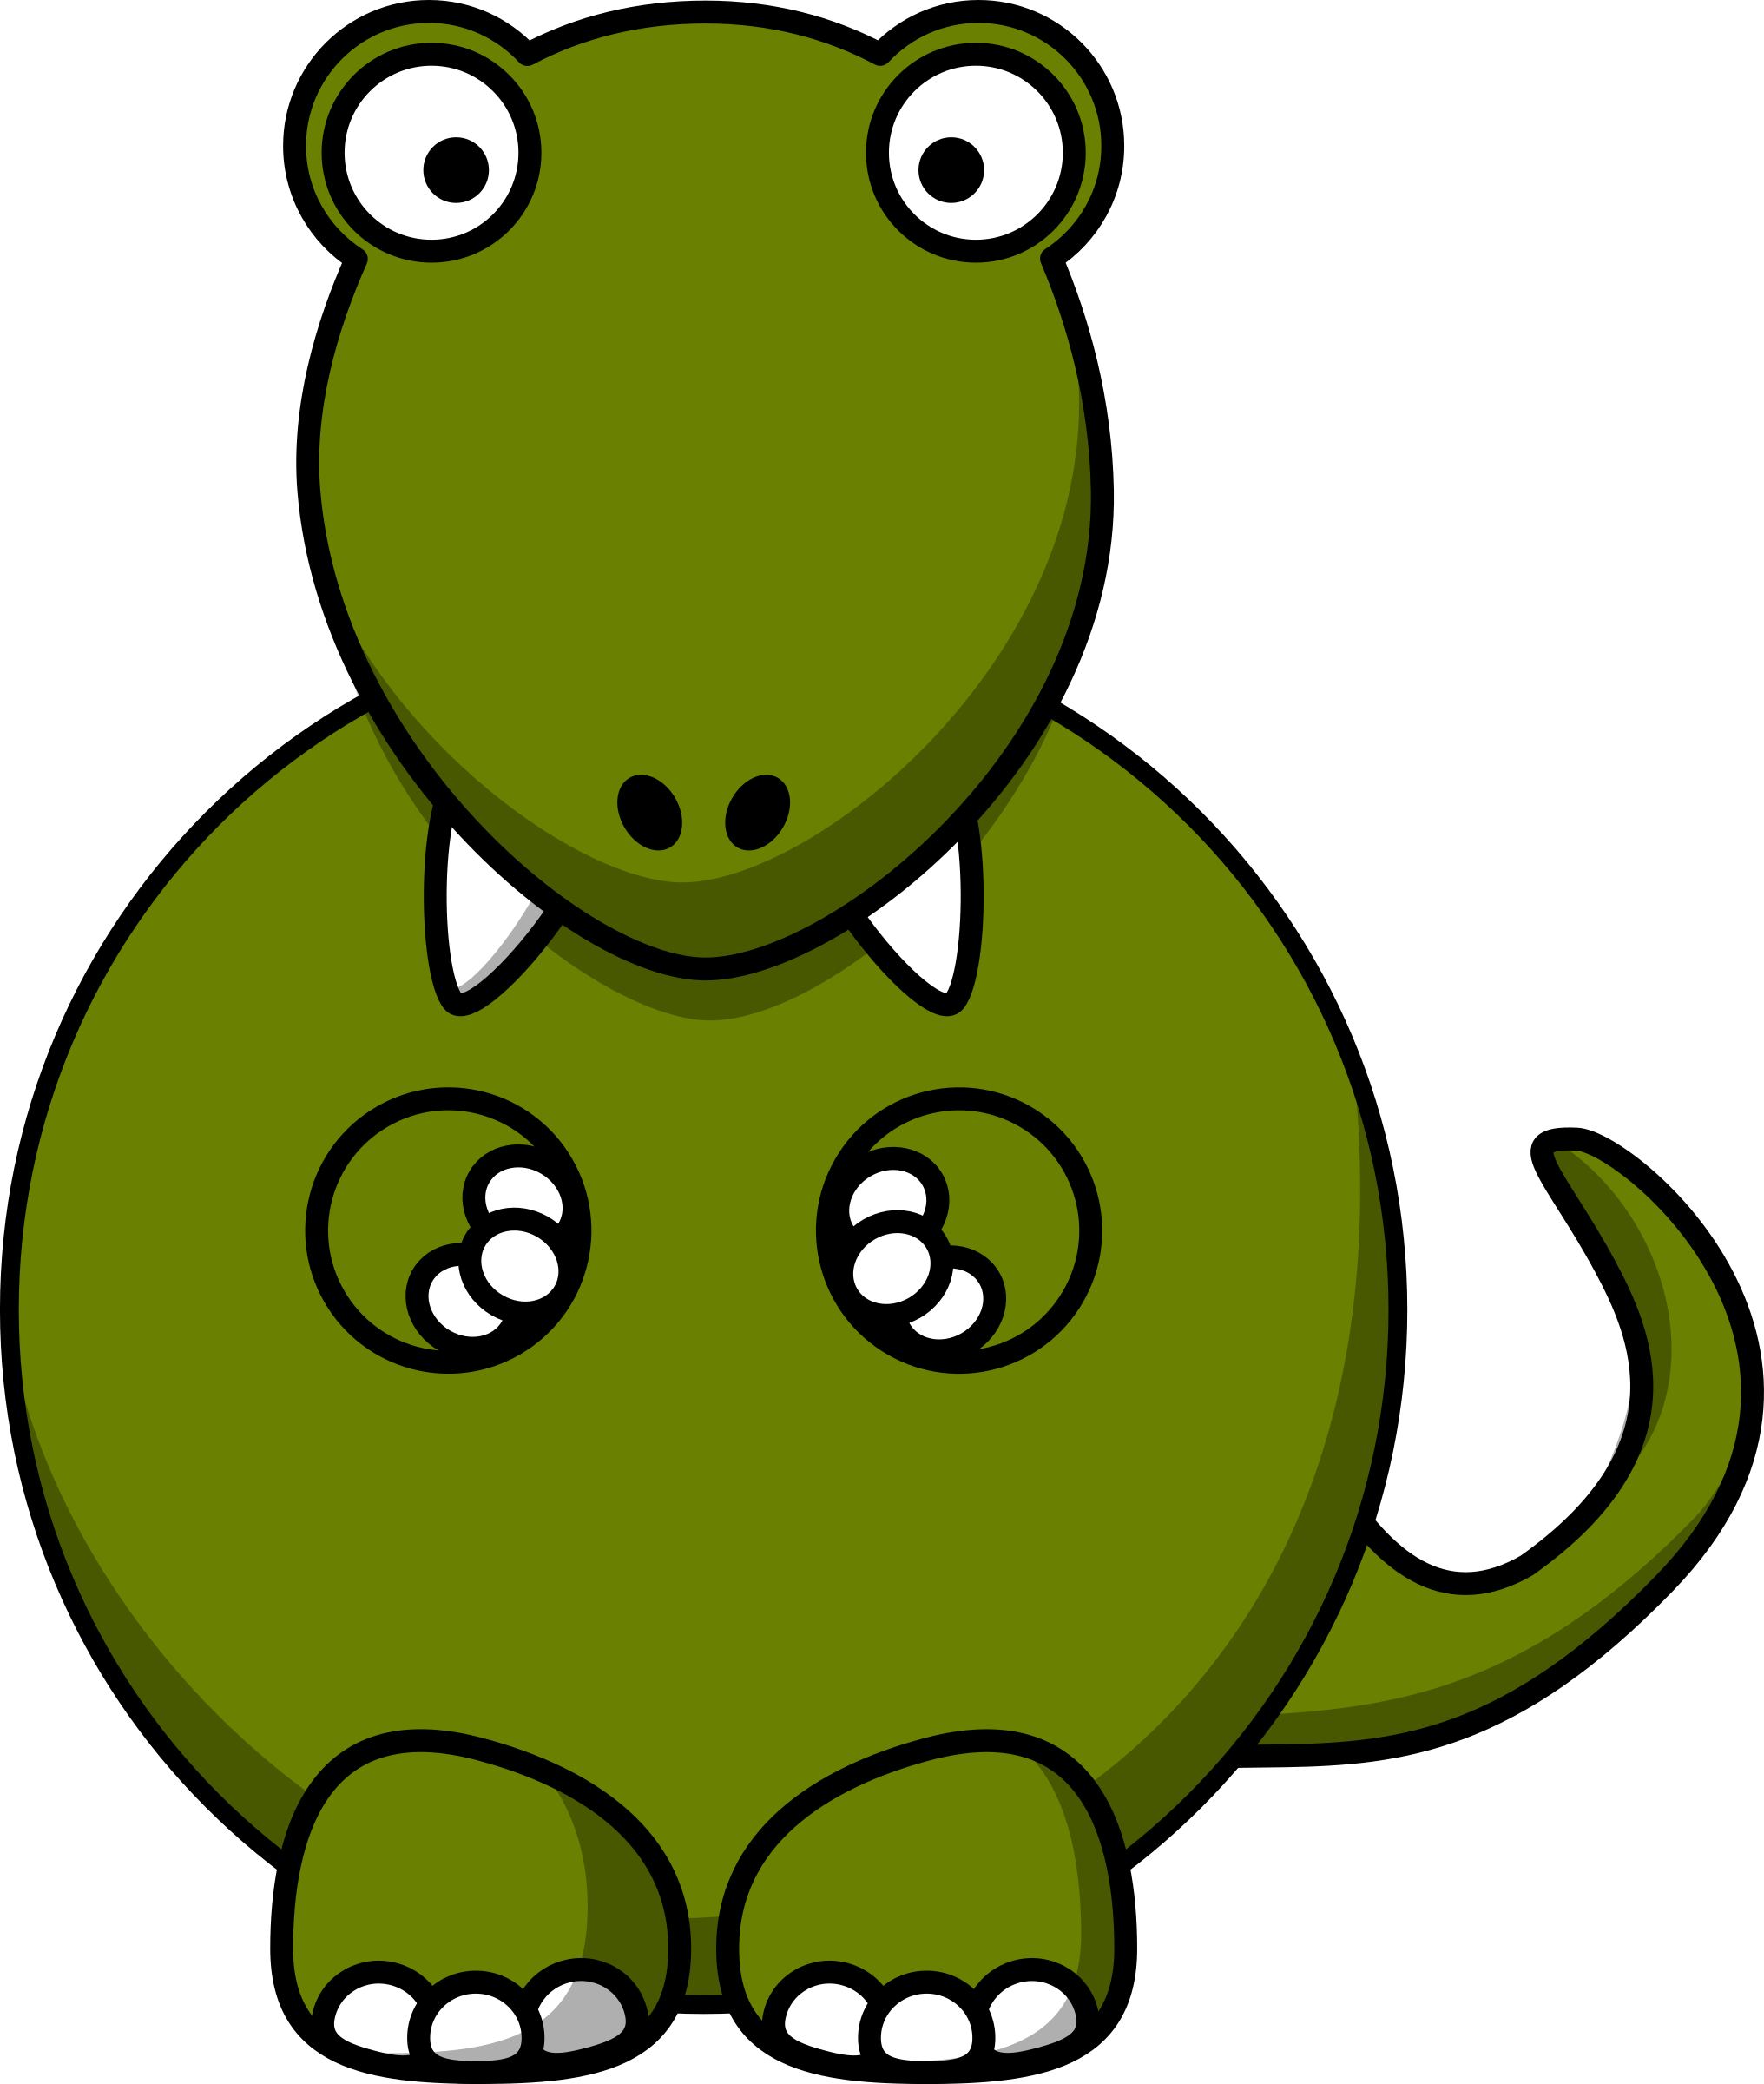 Cartoon tyrannosaurus big image. Green clipart t rex